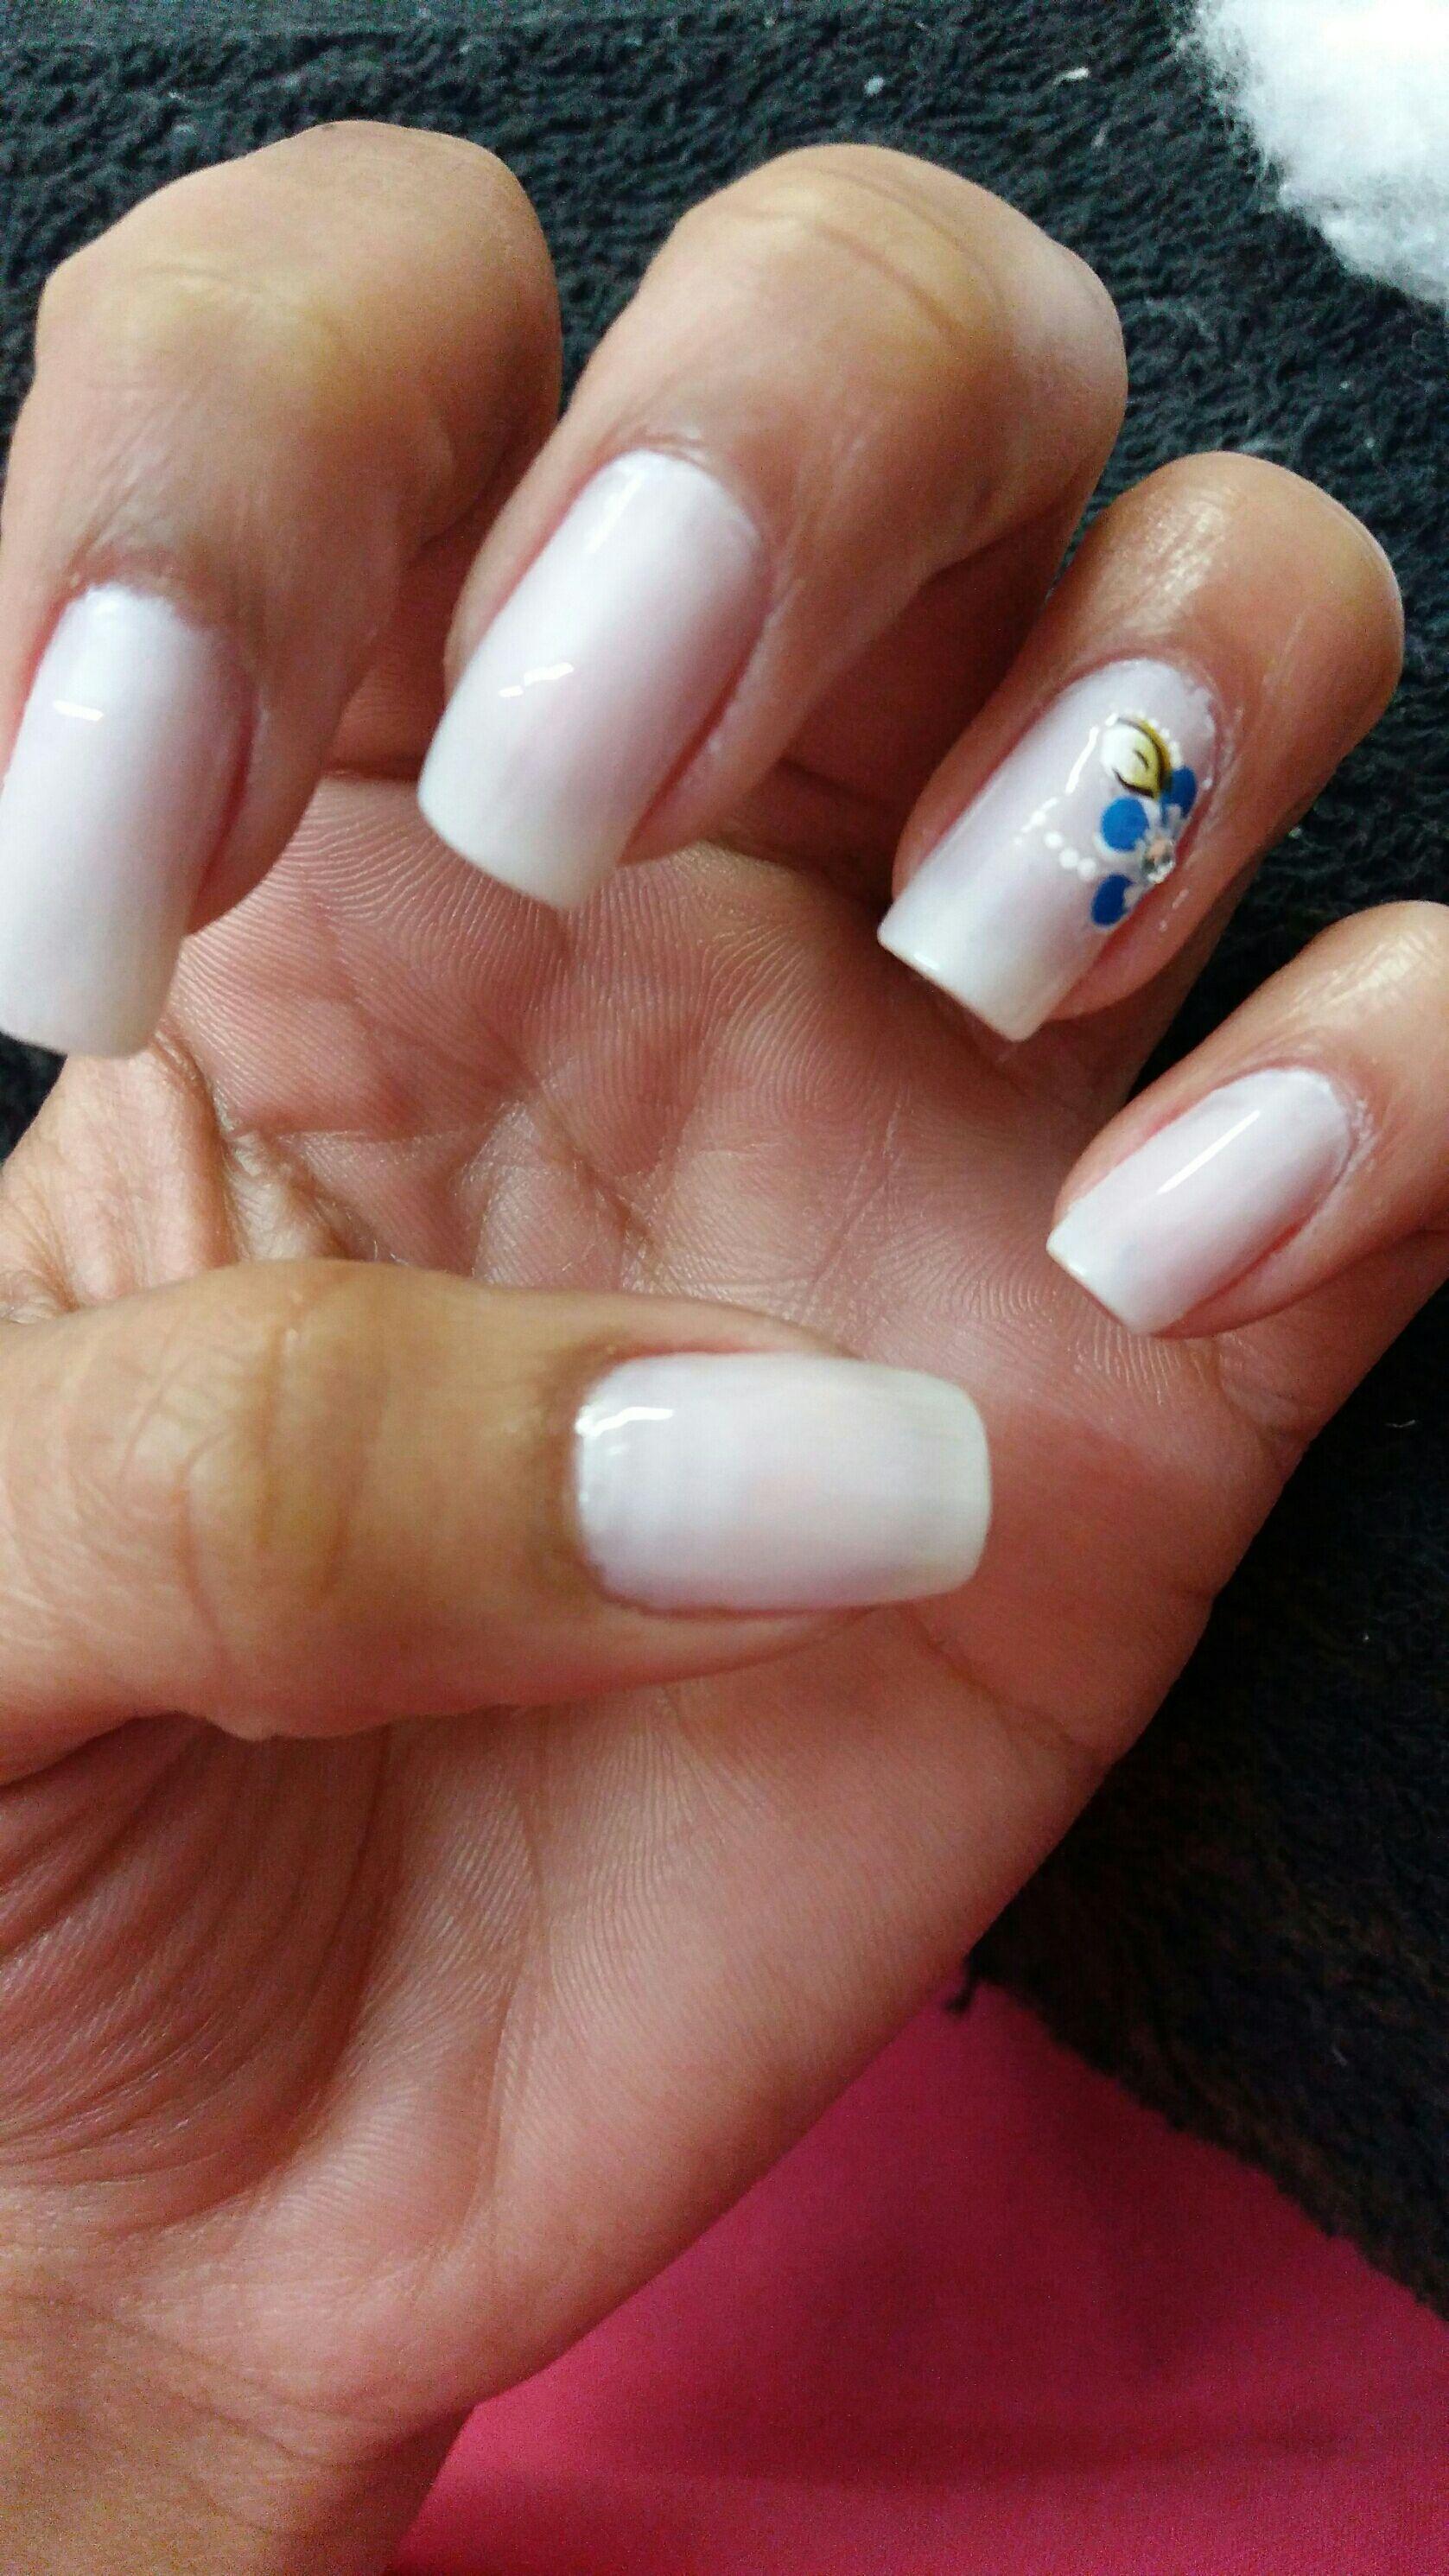 unha manicure e pedicure manicure e pedicure manicure e pedicure manicure e pedicure manicure e pedicure manicure e pedicure manicure e pedicure manicure e pedicure manicure e pedicure manicure e pedicure manicure e pedicure